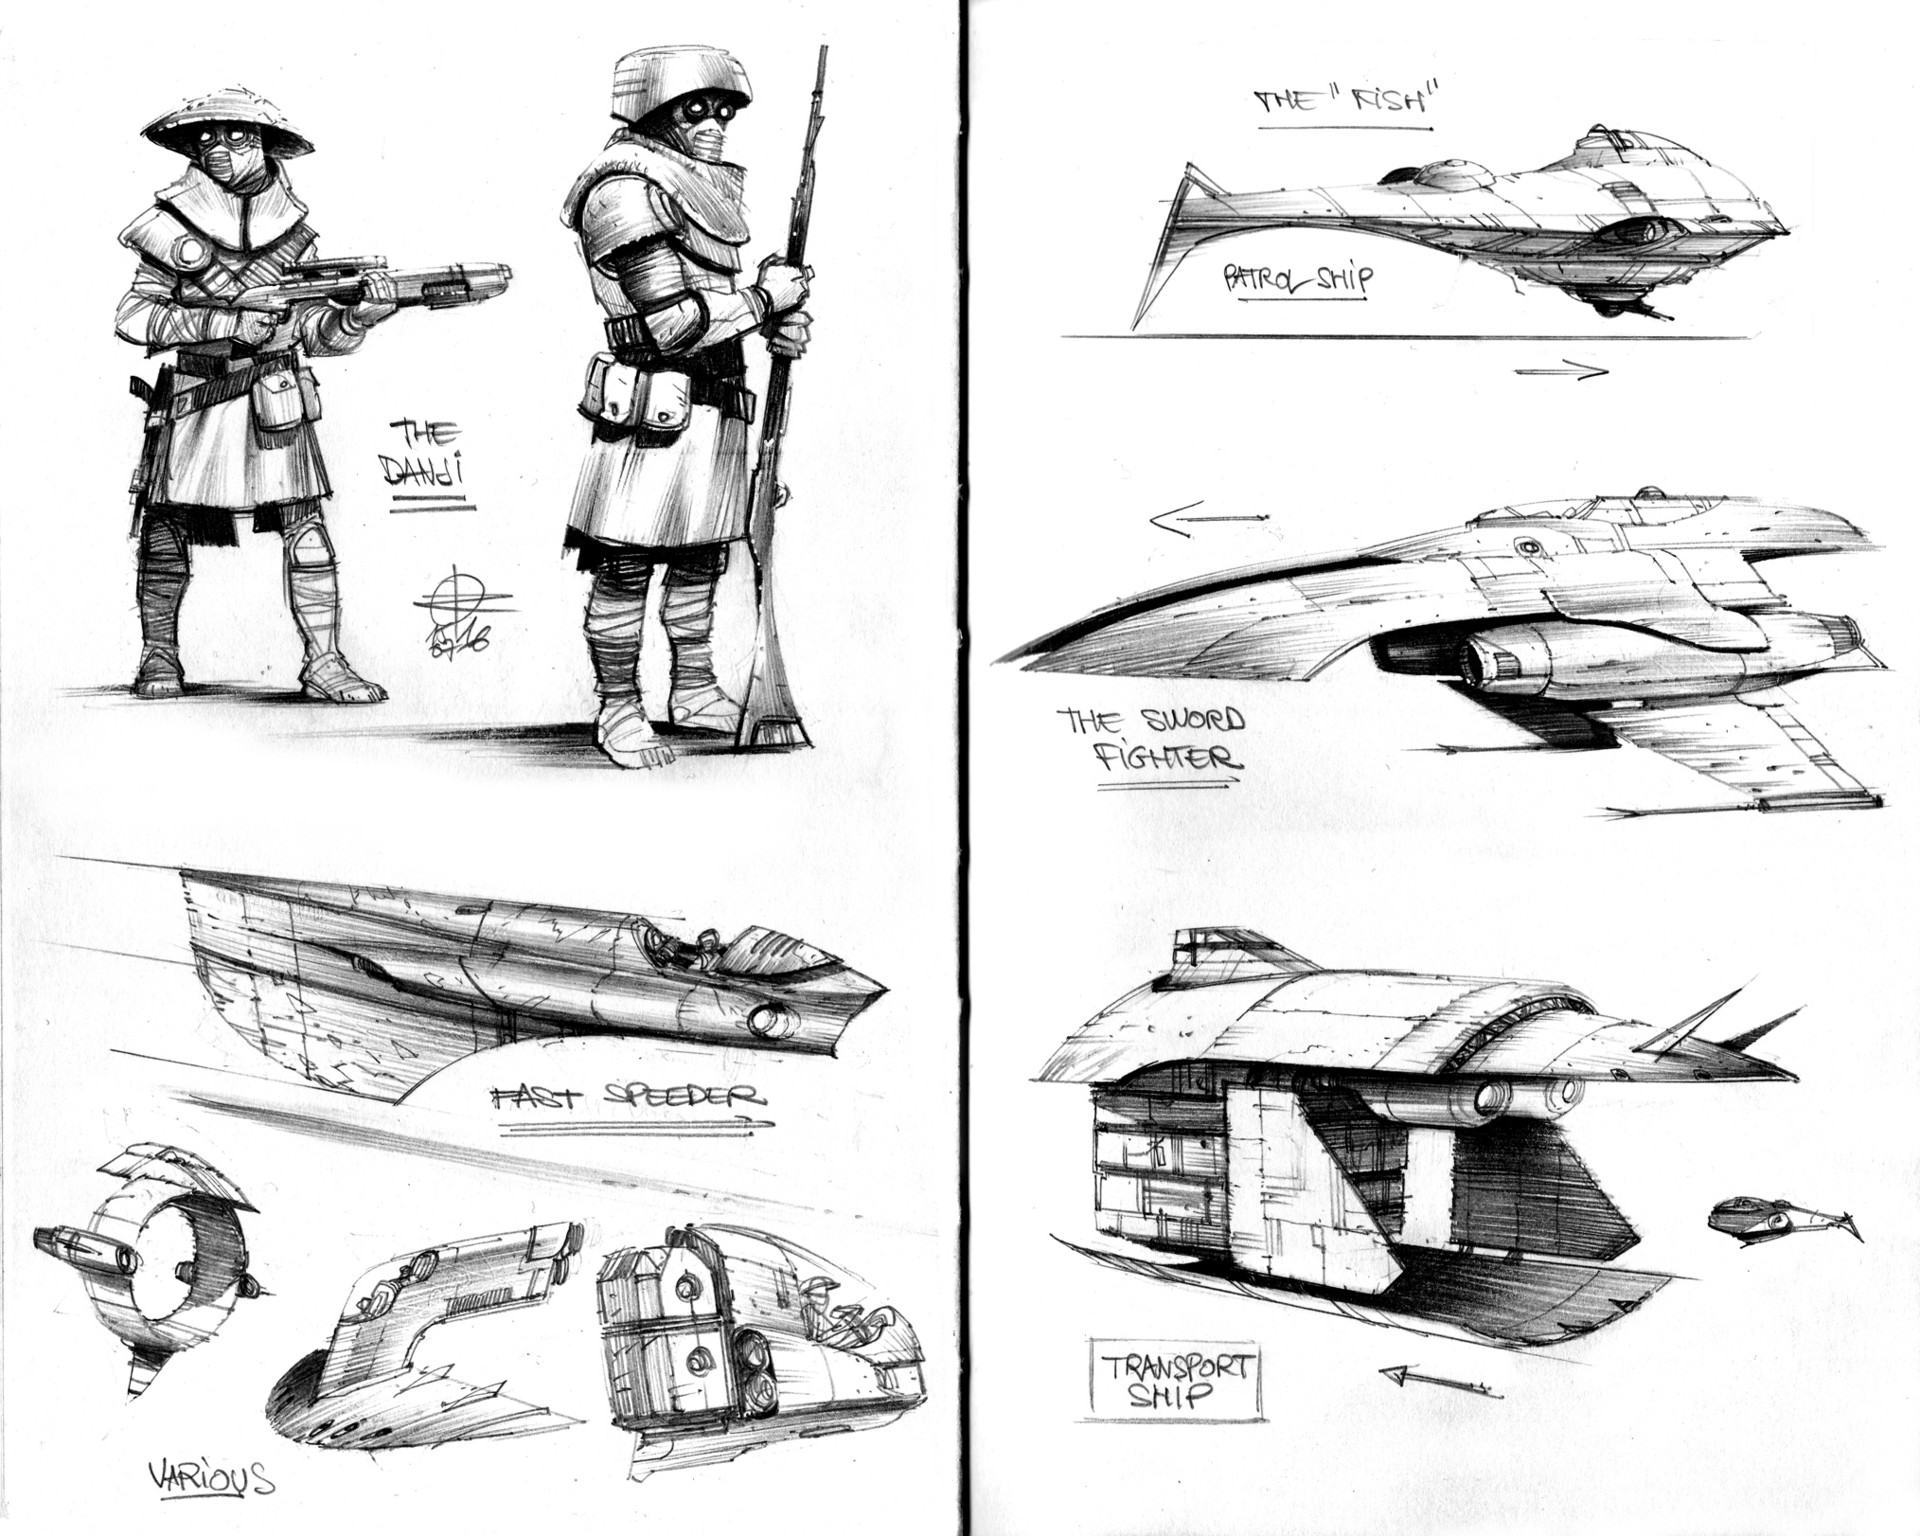 Renaud roche part02 sketches01b